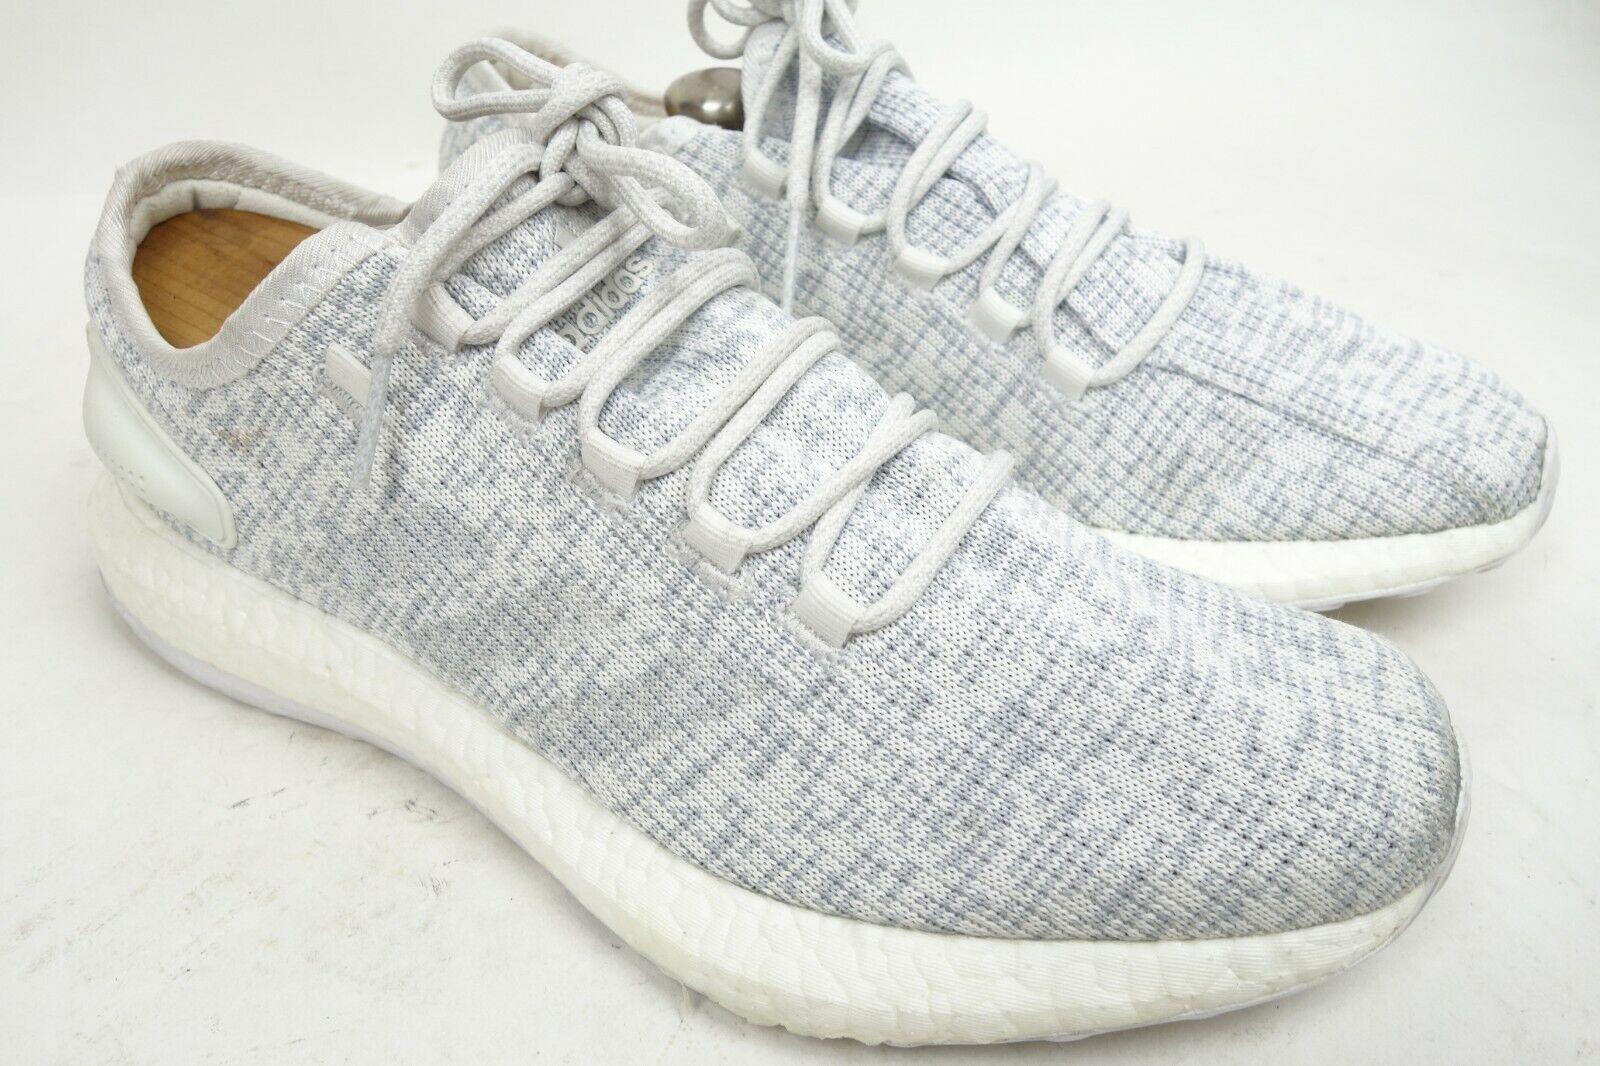 Adidas PureBoost Running shoes BA8893 Men Size 11 Msrp  140